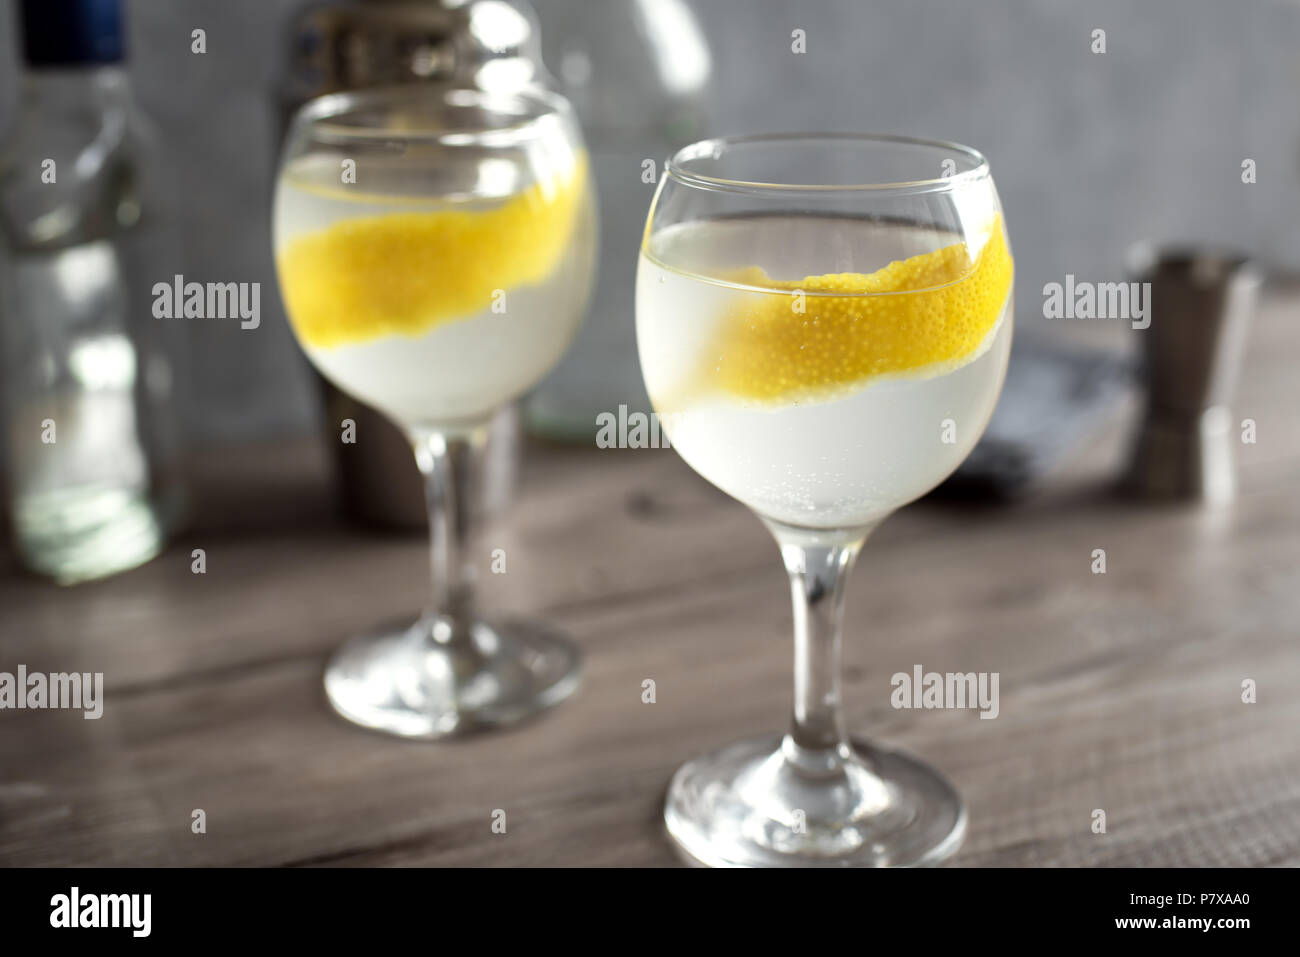 Vesper Martini Cocktail with lemon wedge. Homemade Vesper Cocktail on table, copy space. Stock Photo